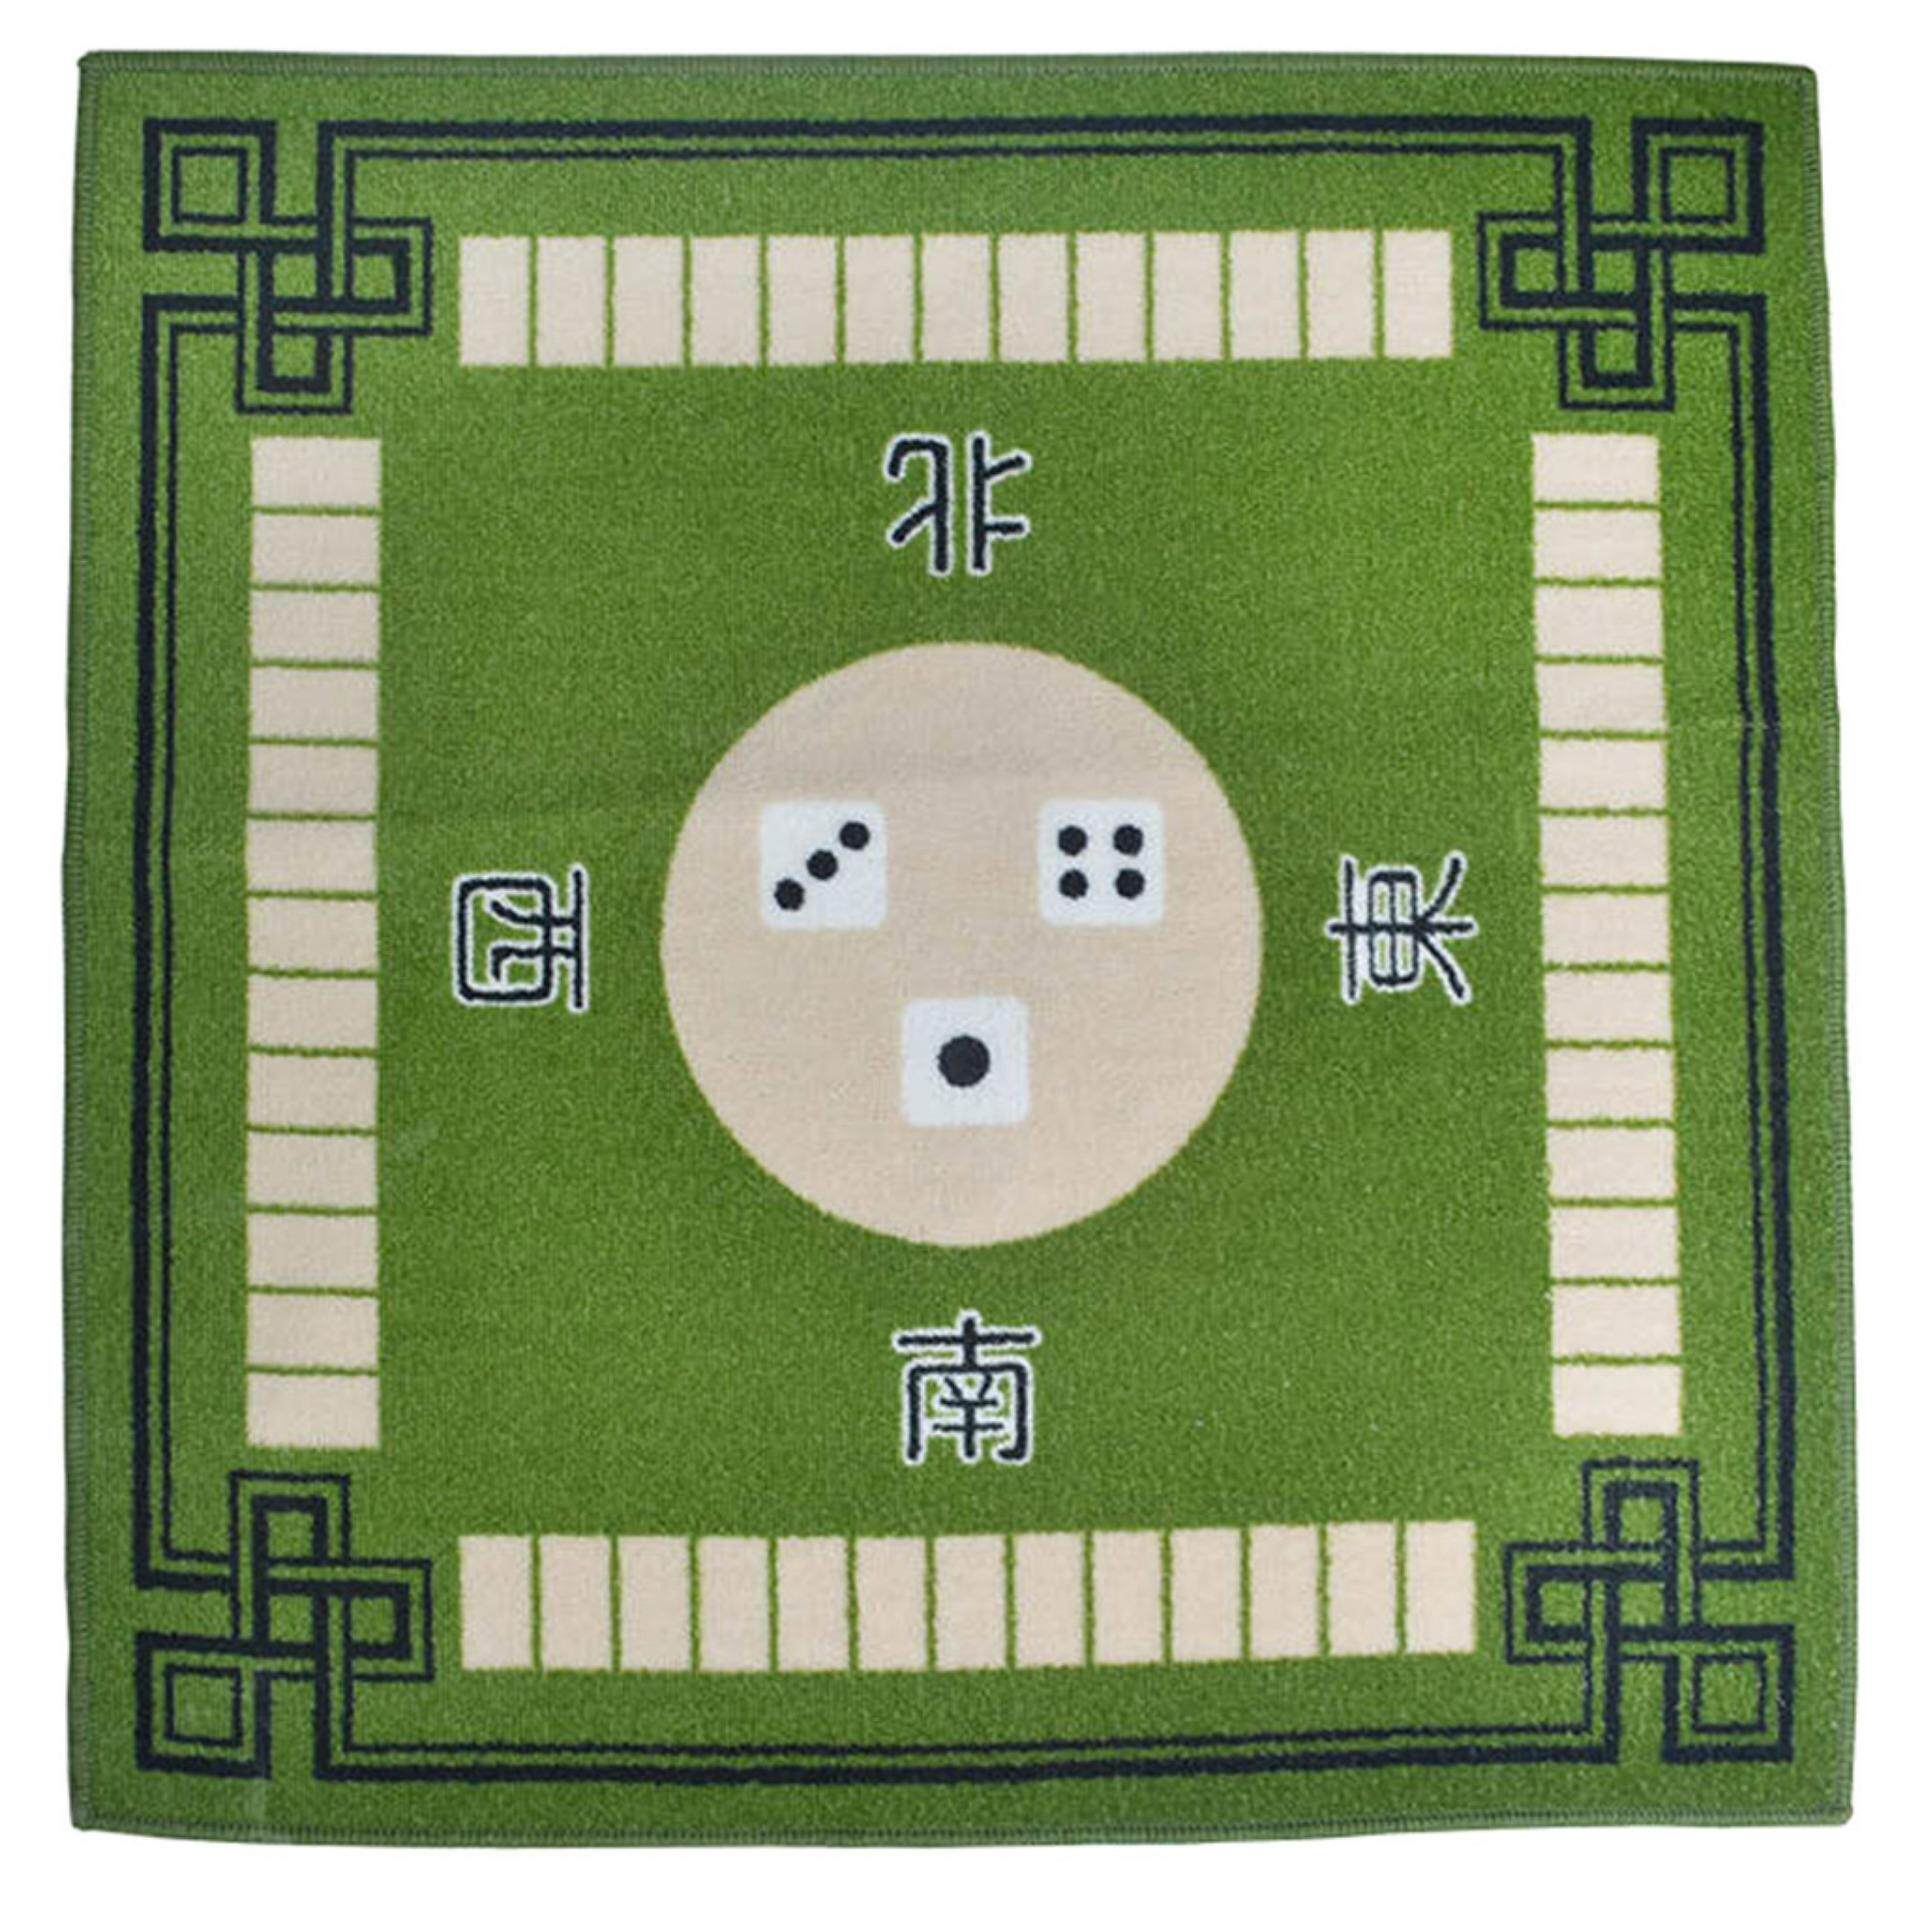 Sale Bolehdeals Mahjong Table Mat Cloth Household Silence Anti Skid 79X79Cm Card Game Green Intl On Hong Kong Sar China